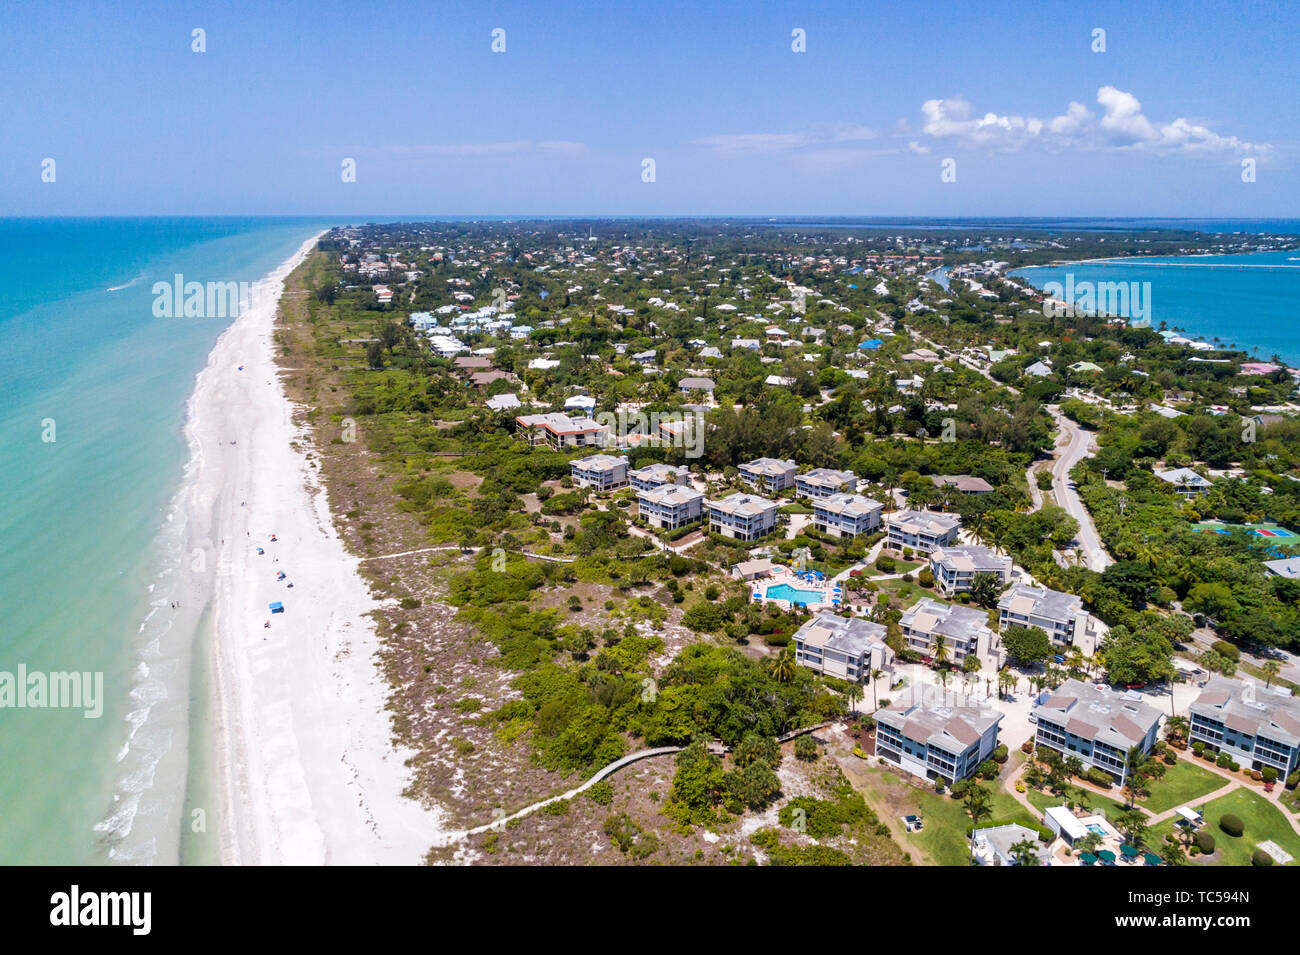 Sanibel Island Florida Gulf of Mexico beach Periwinkle Way homes Sanibel Beach Club resort aerial overhead bird's eye view above - Stock Image